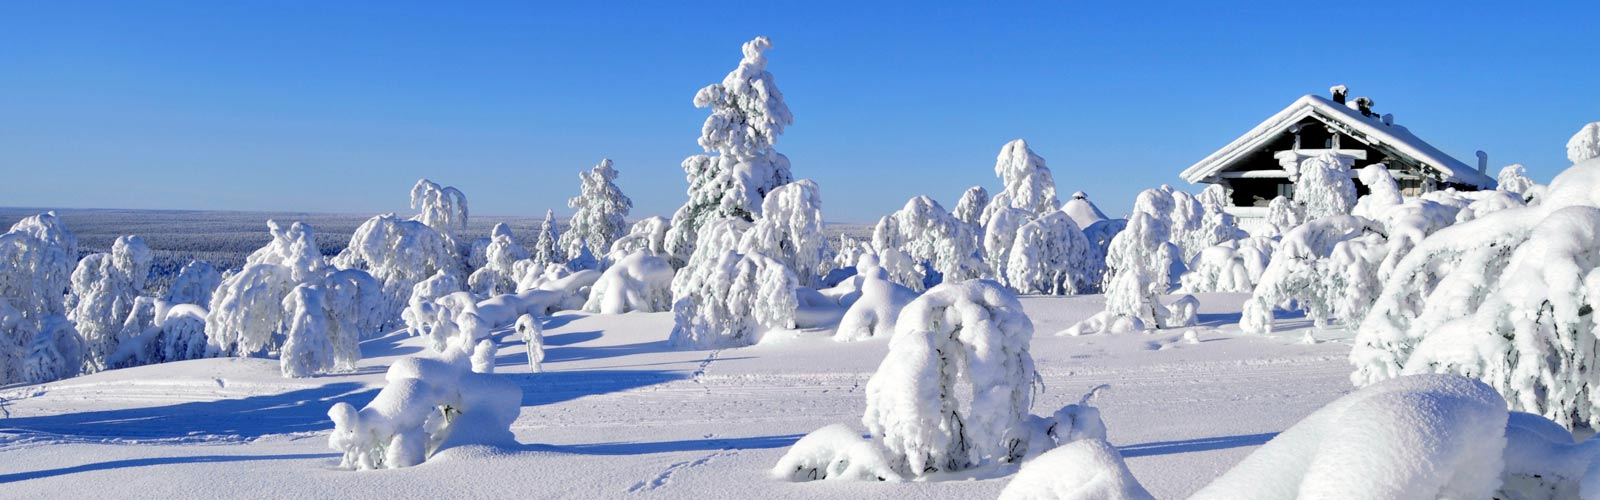 Viaje a Laponia. 6 Dic.